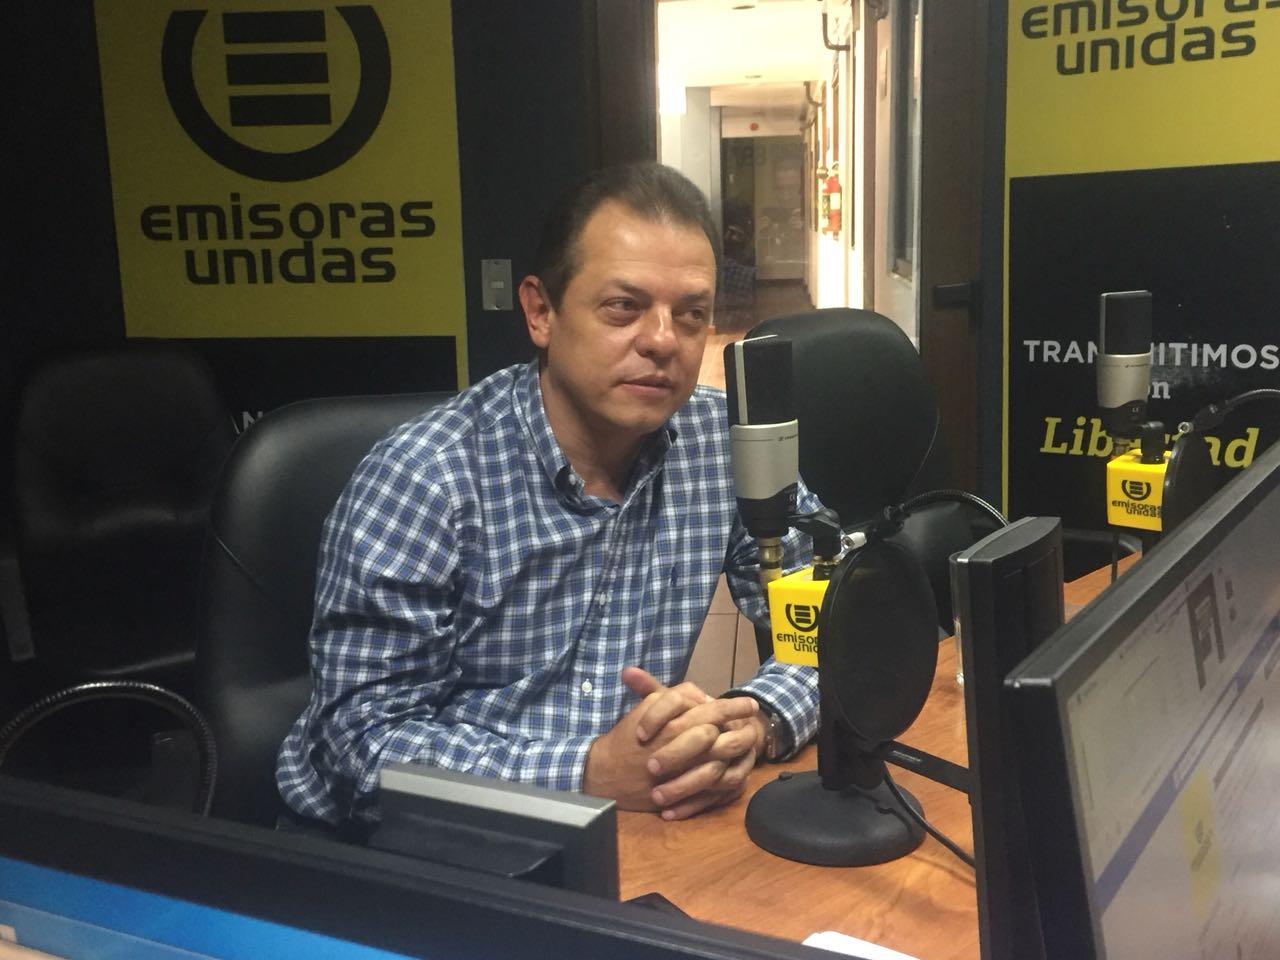 Oscar Molliner EU Emisoras Unidas Guatemala